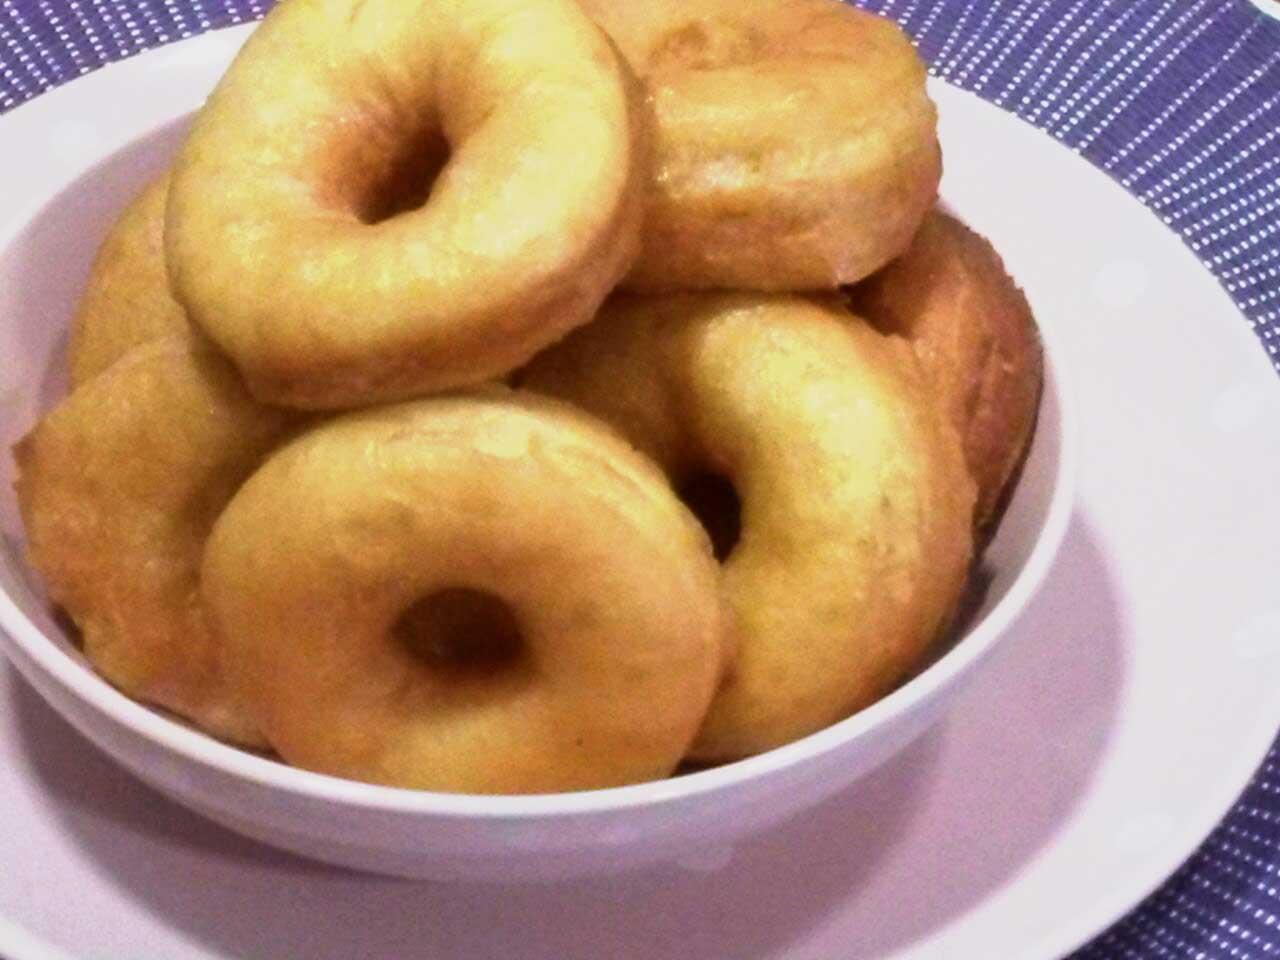 Donuts caseros con azúcar integral ecológico